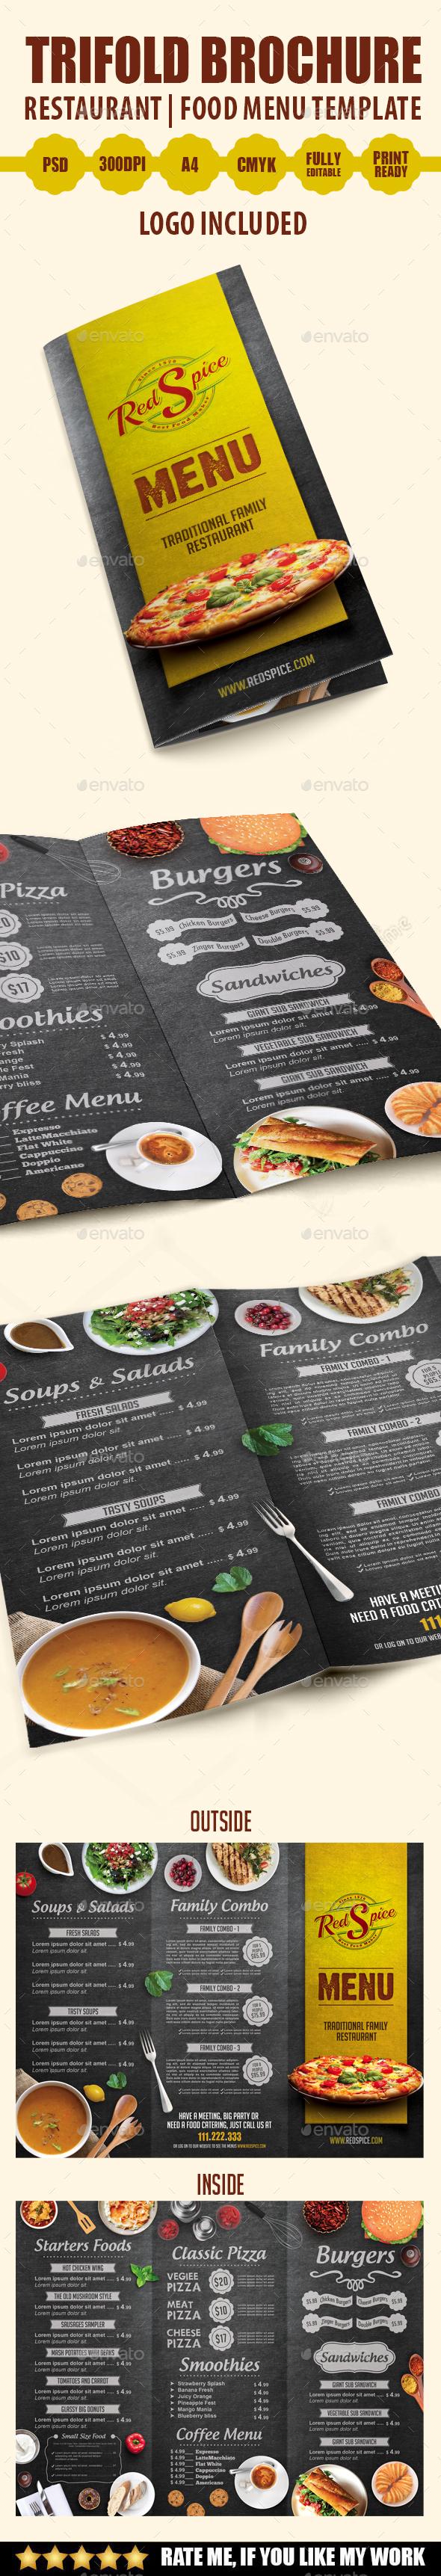 Trifold Brochure Restaurant Menu Template